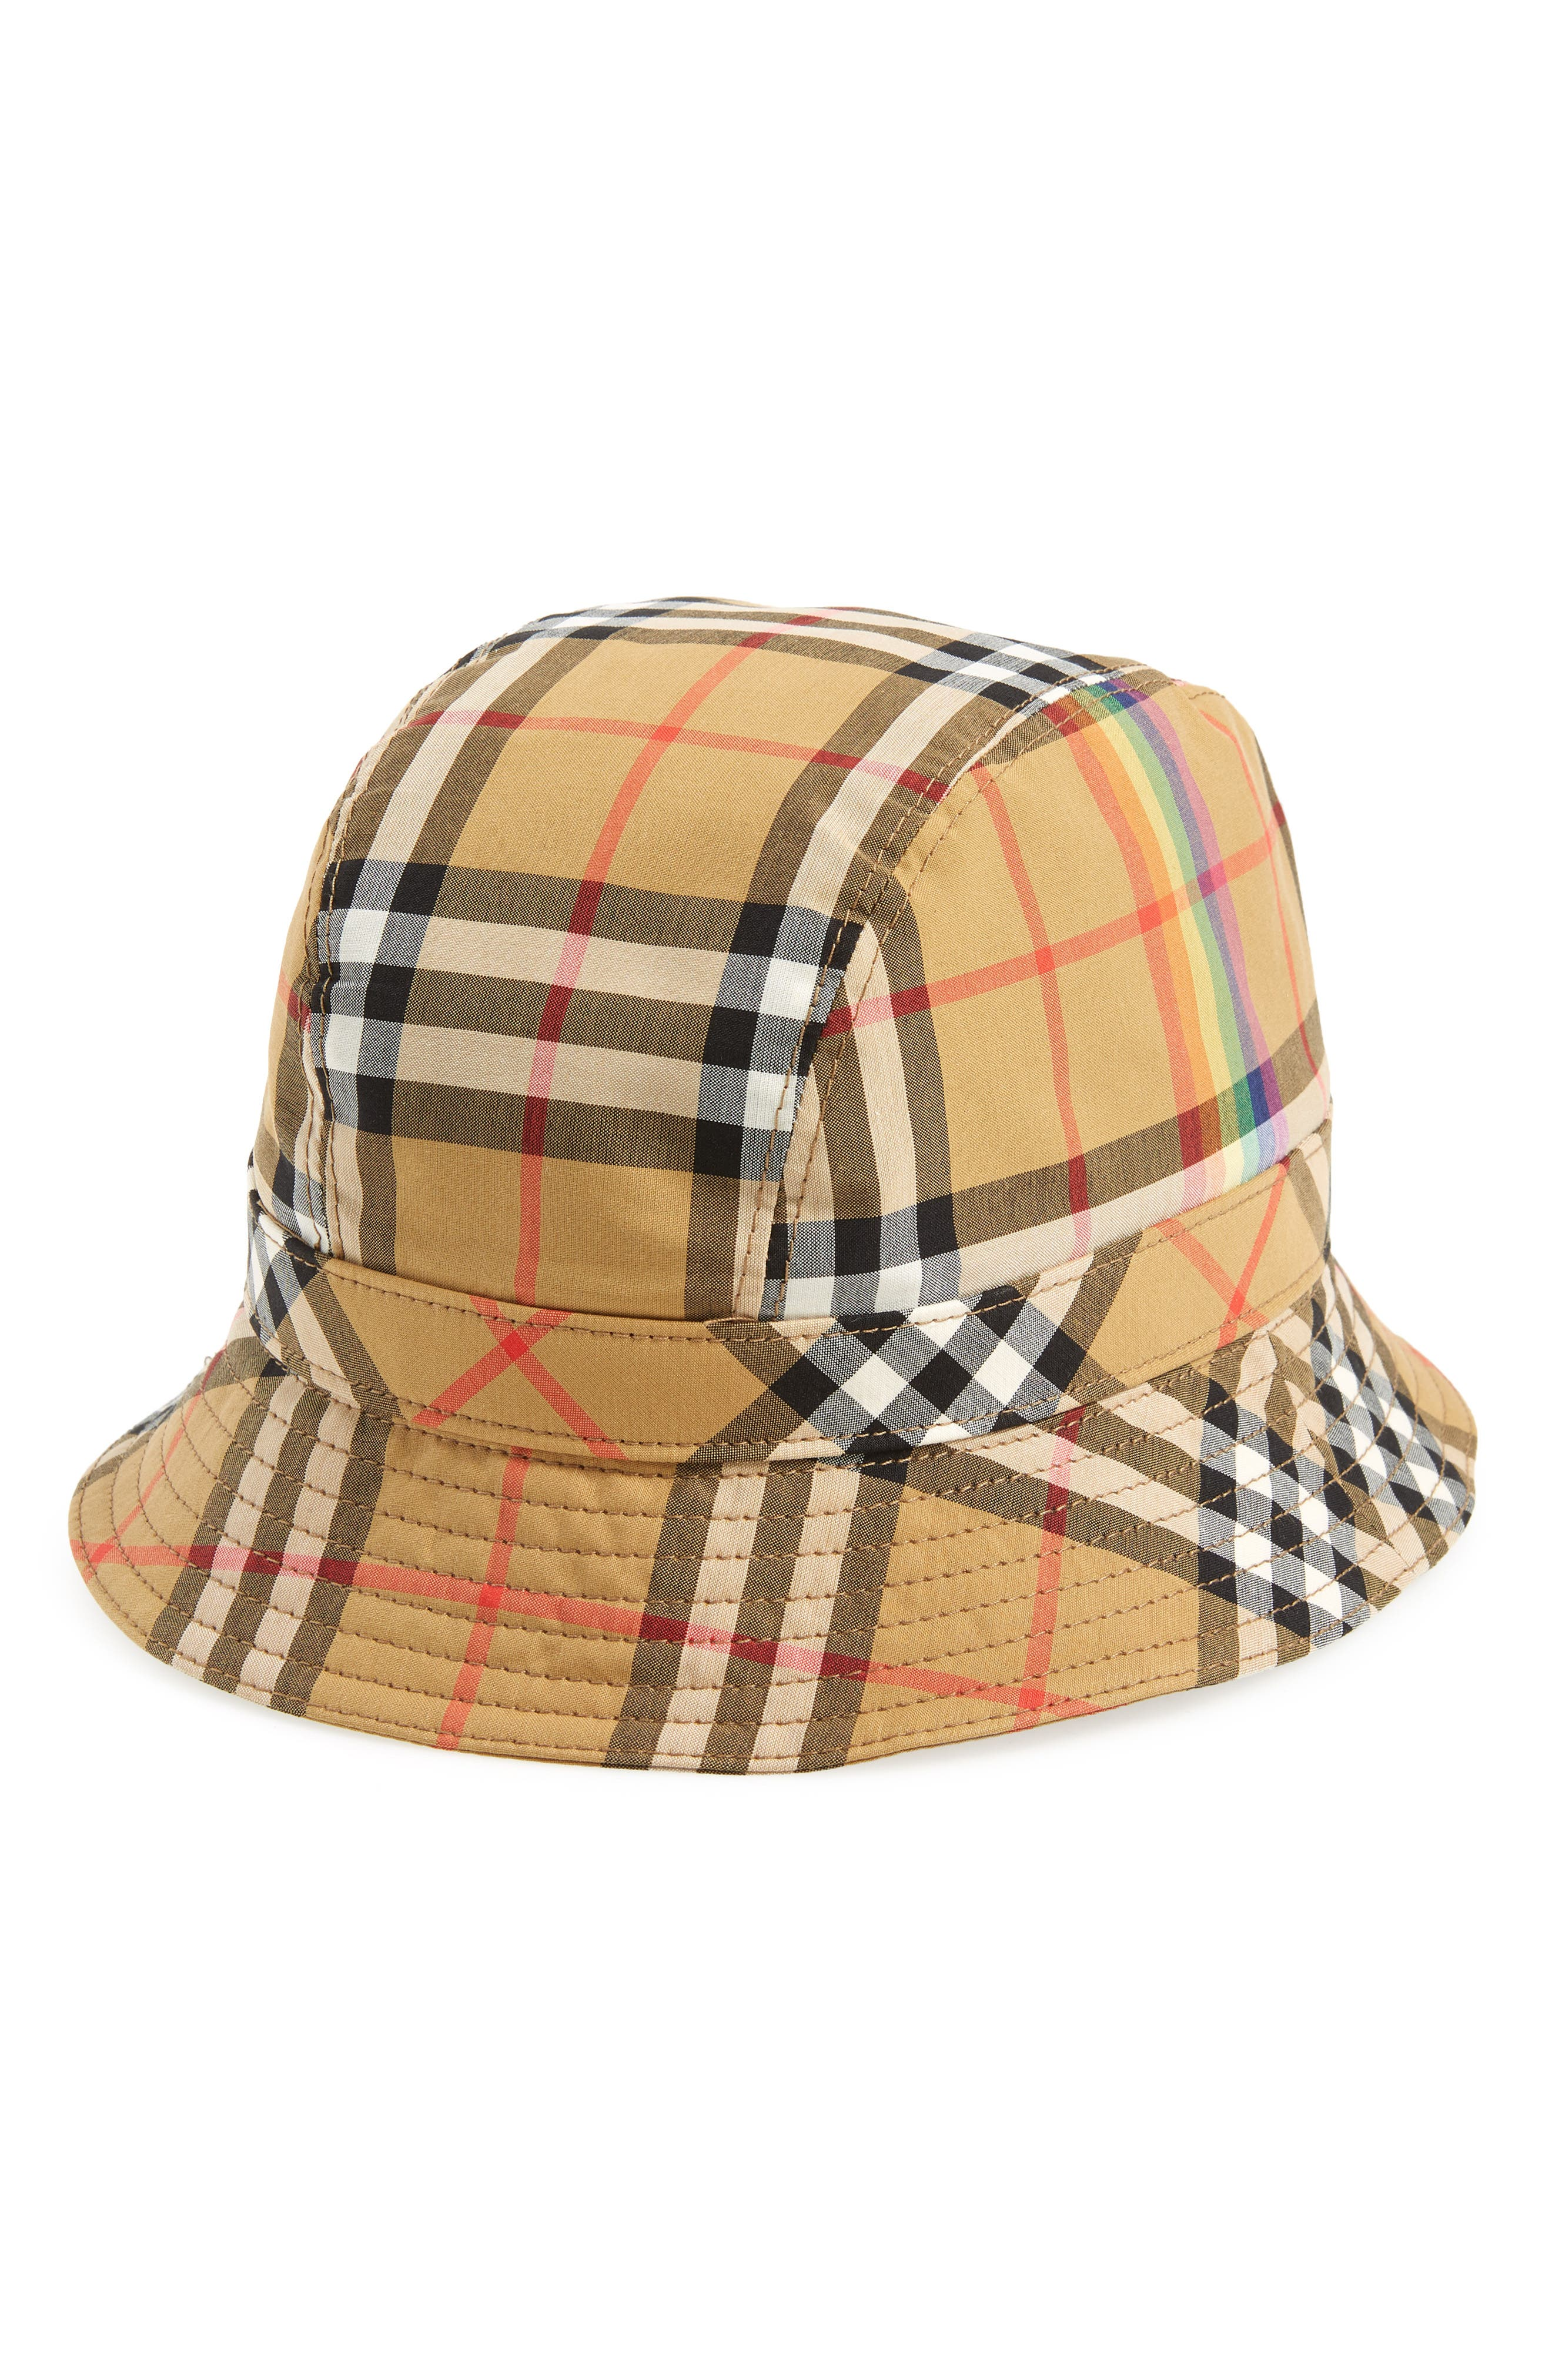 Rainbow Stripe Vintage Check Bucket Hat,                             Main thumbnail 1, color,                             ANTIQUE YELLOW/ RAINBOW